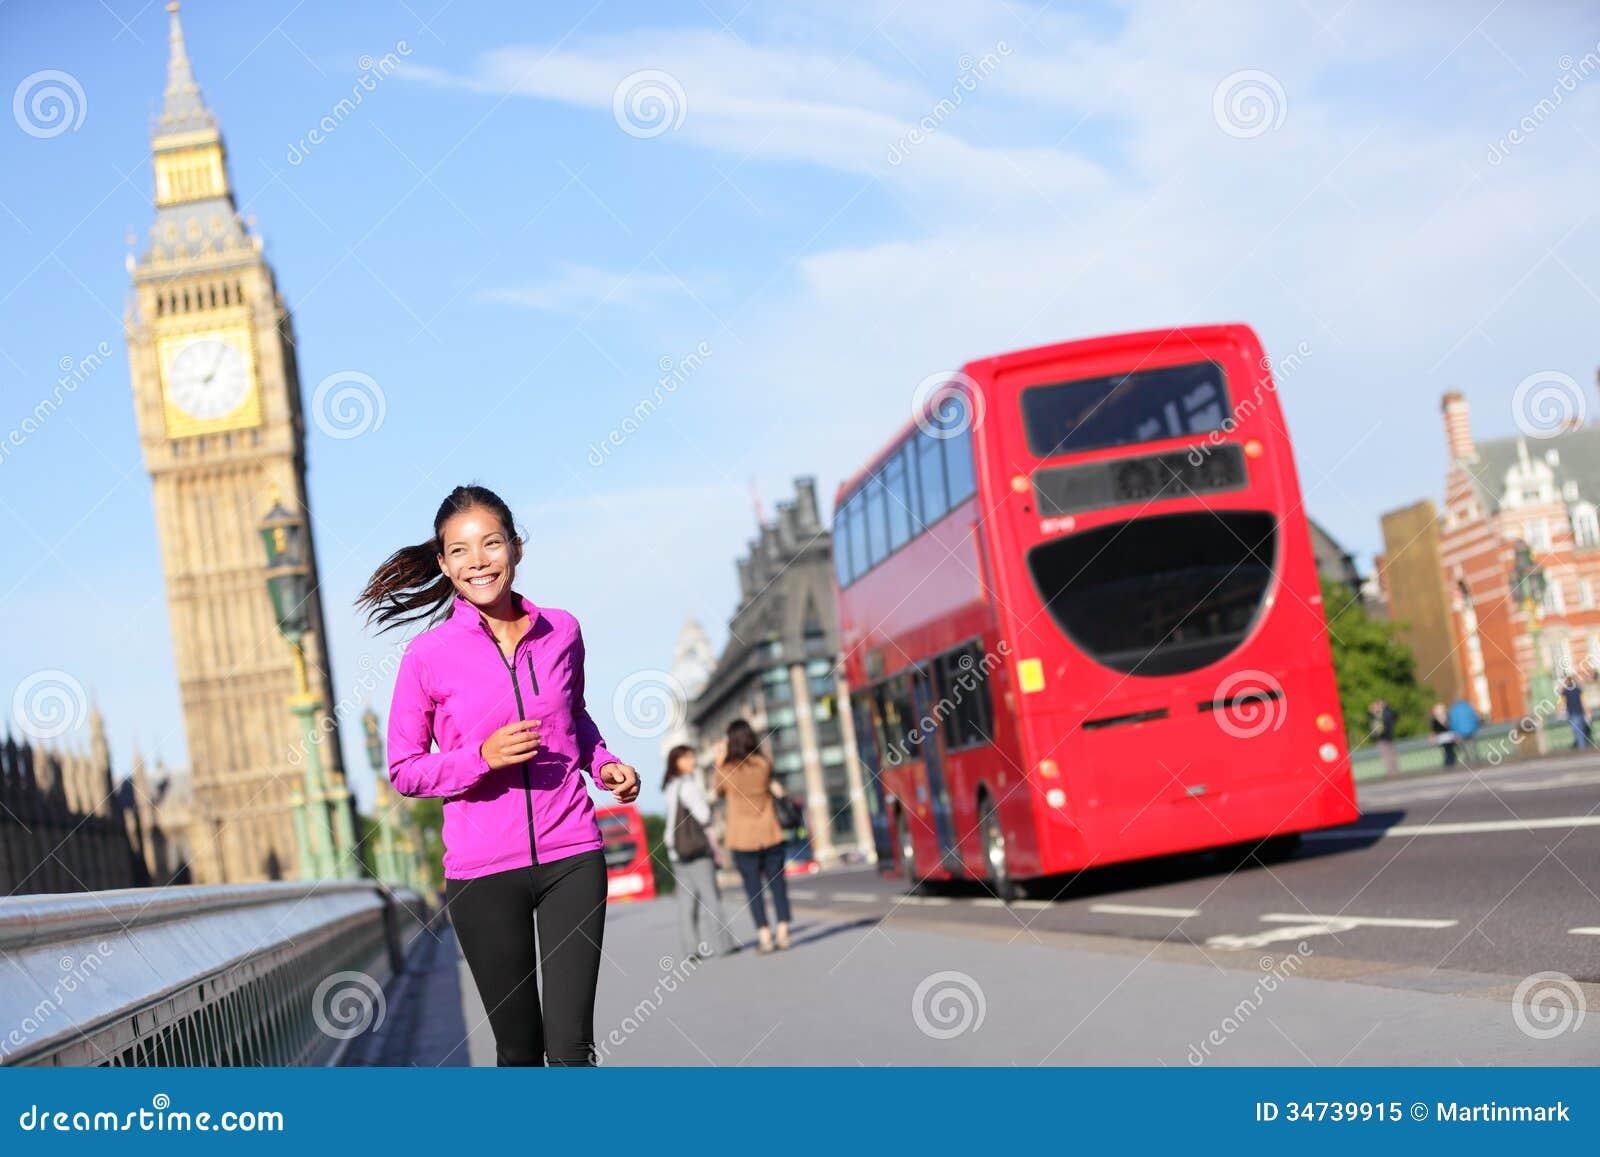 london lifestyle woman running near big ben stock image